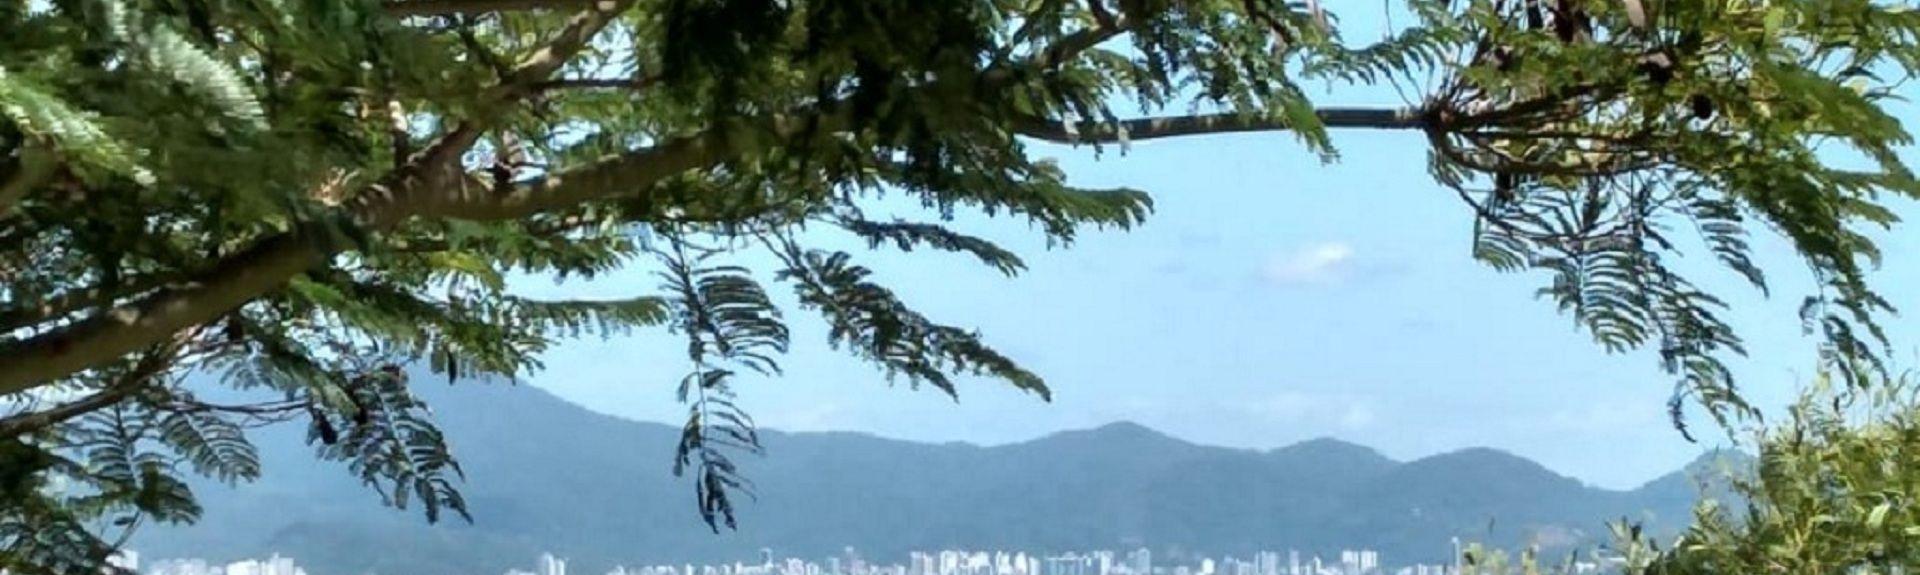 Zimbros, Bombinhas, South Region, Brazil